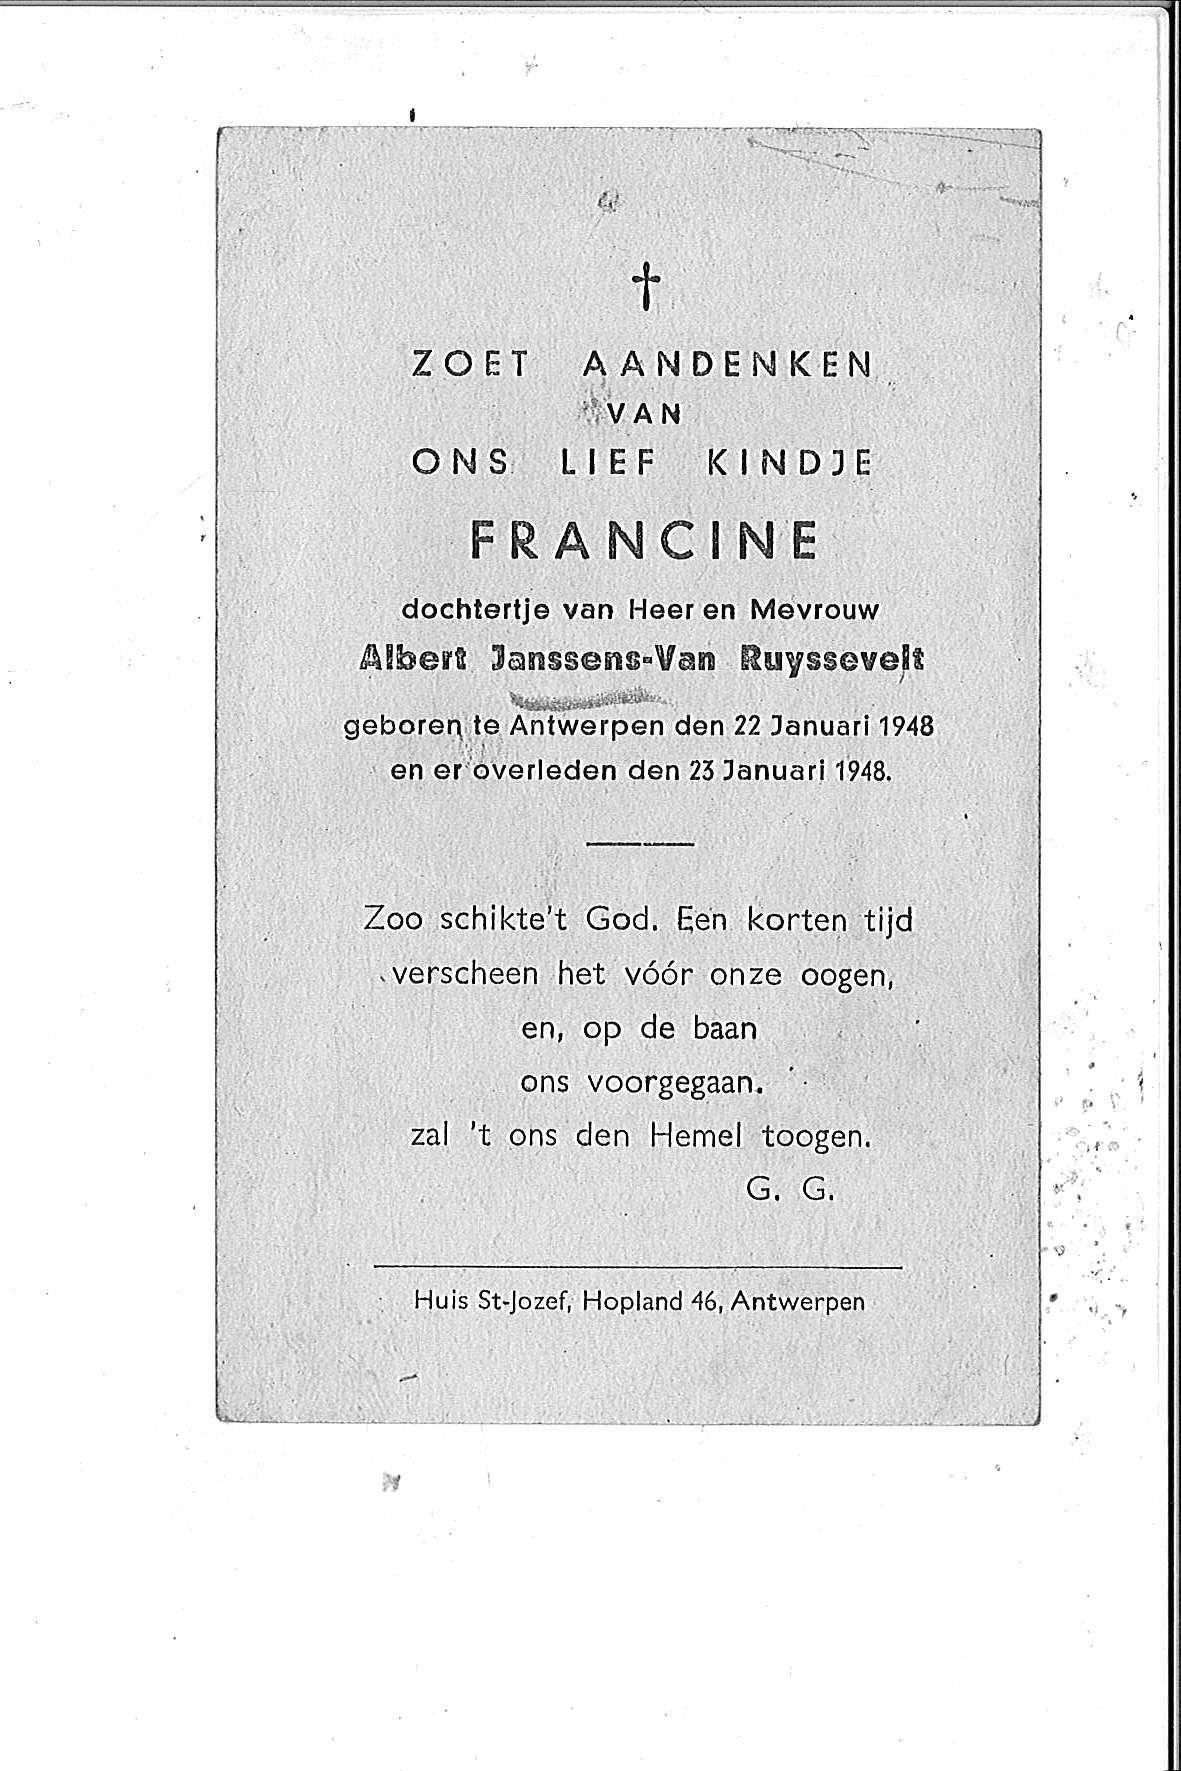 Francine(1948)20150330095309_00006.jpg